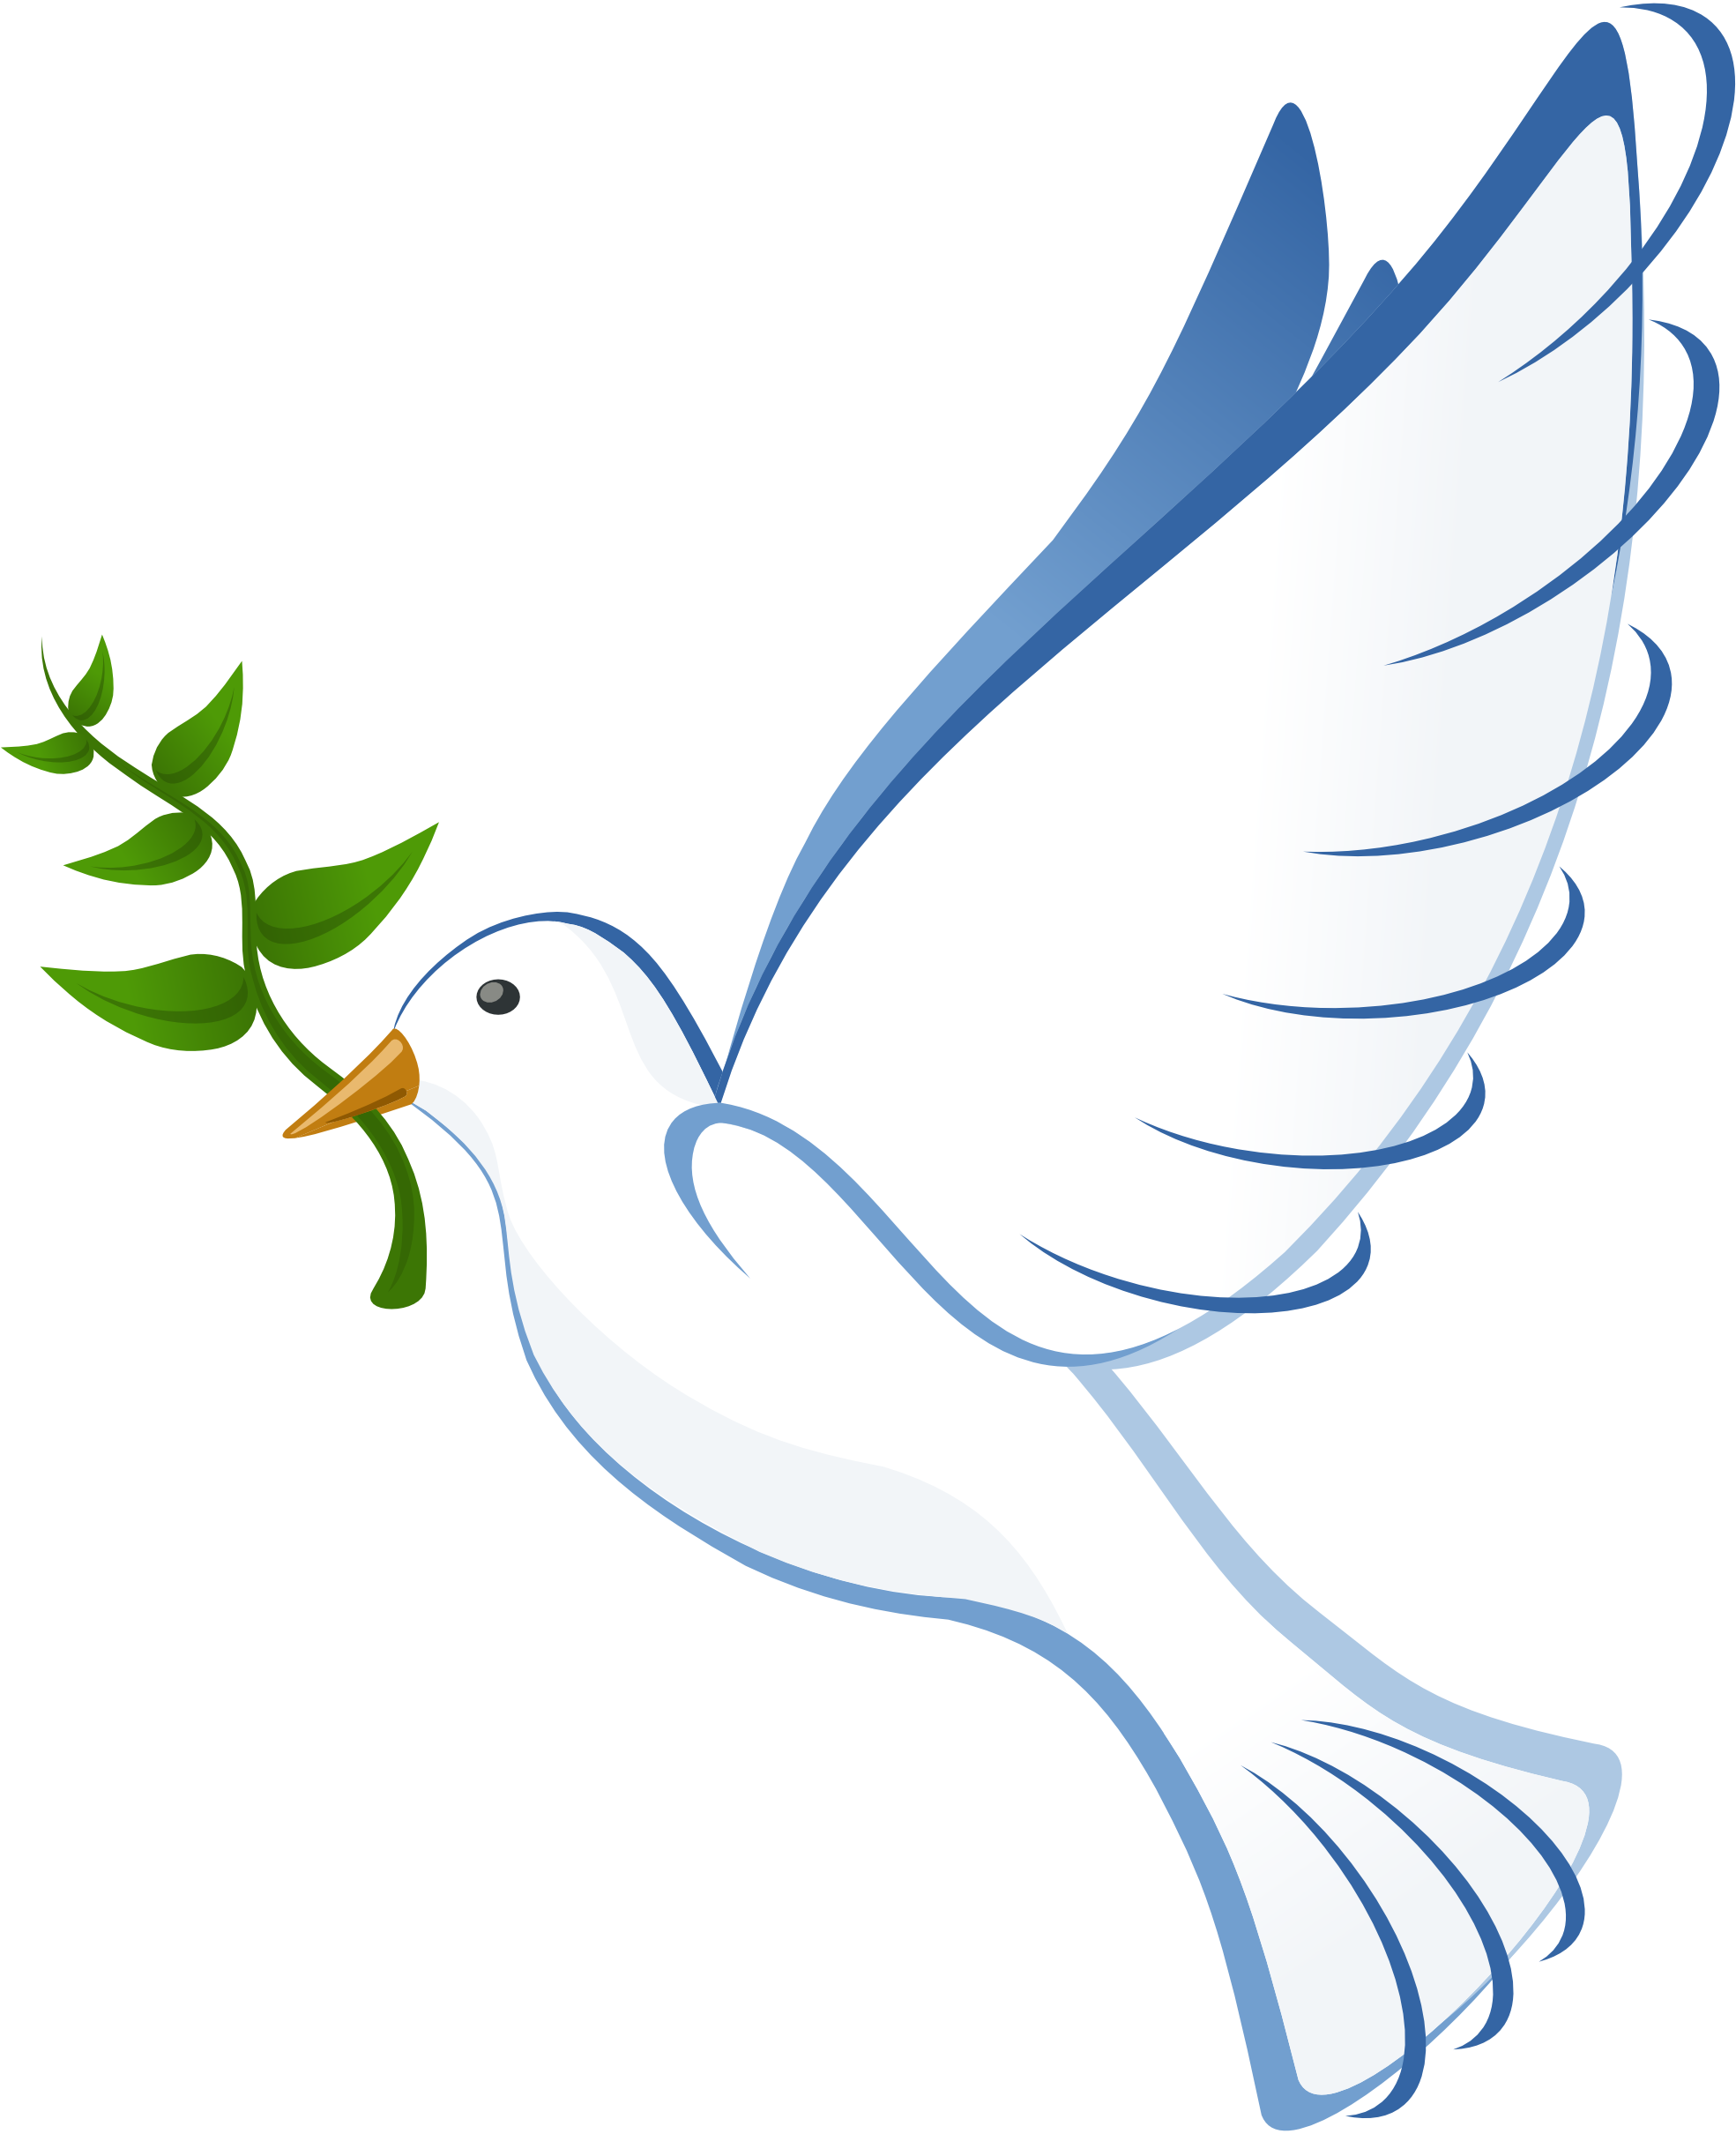 Doves clipart vector png. Clipartist net clip art